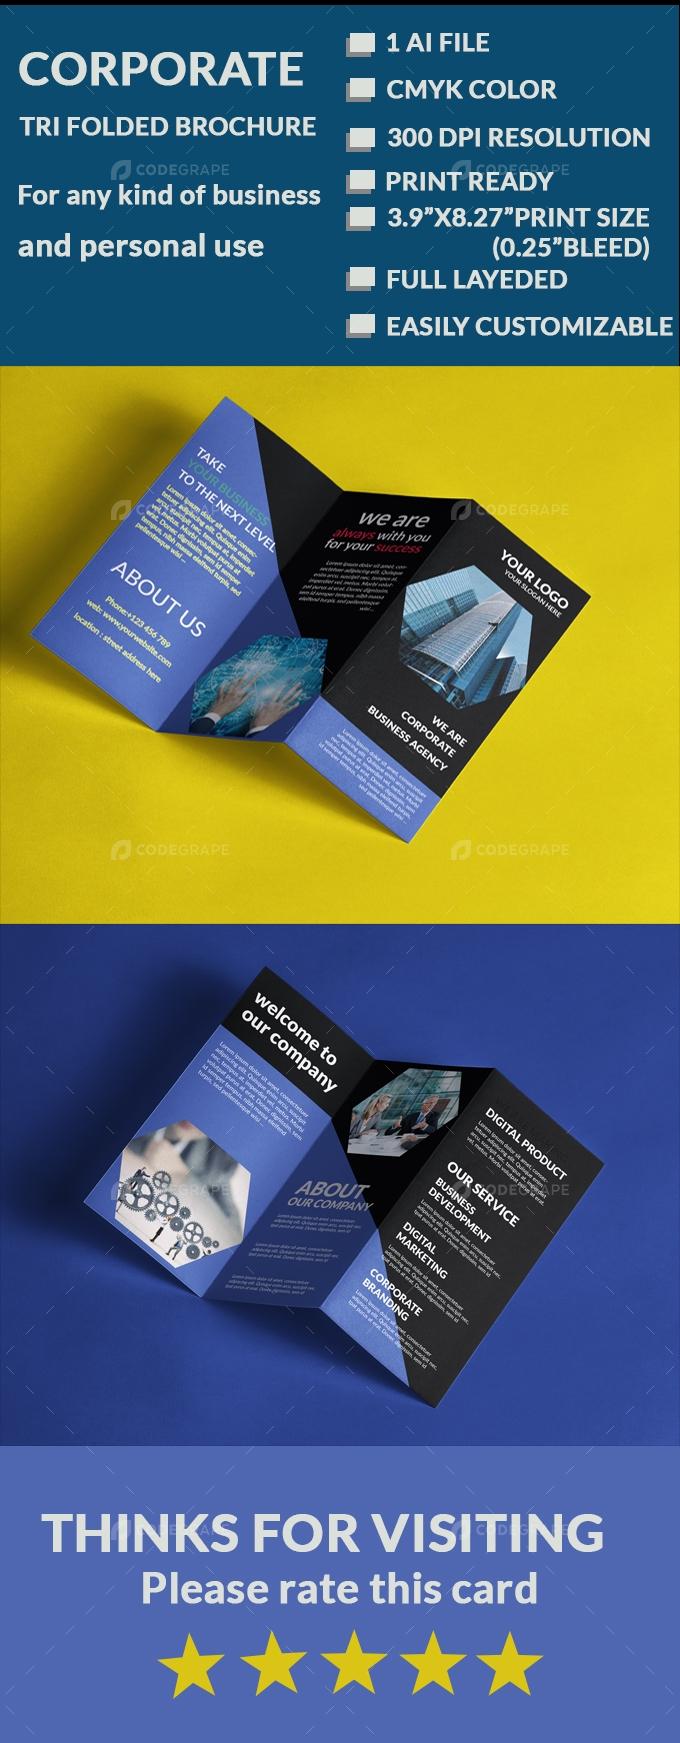 Corporate Tri -Folded Brochure